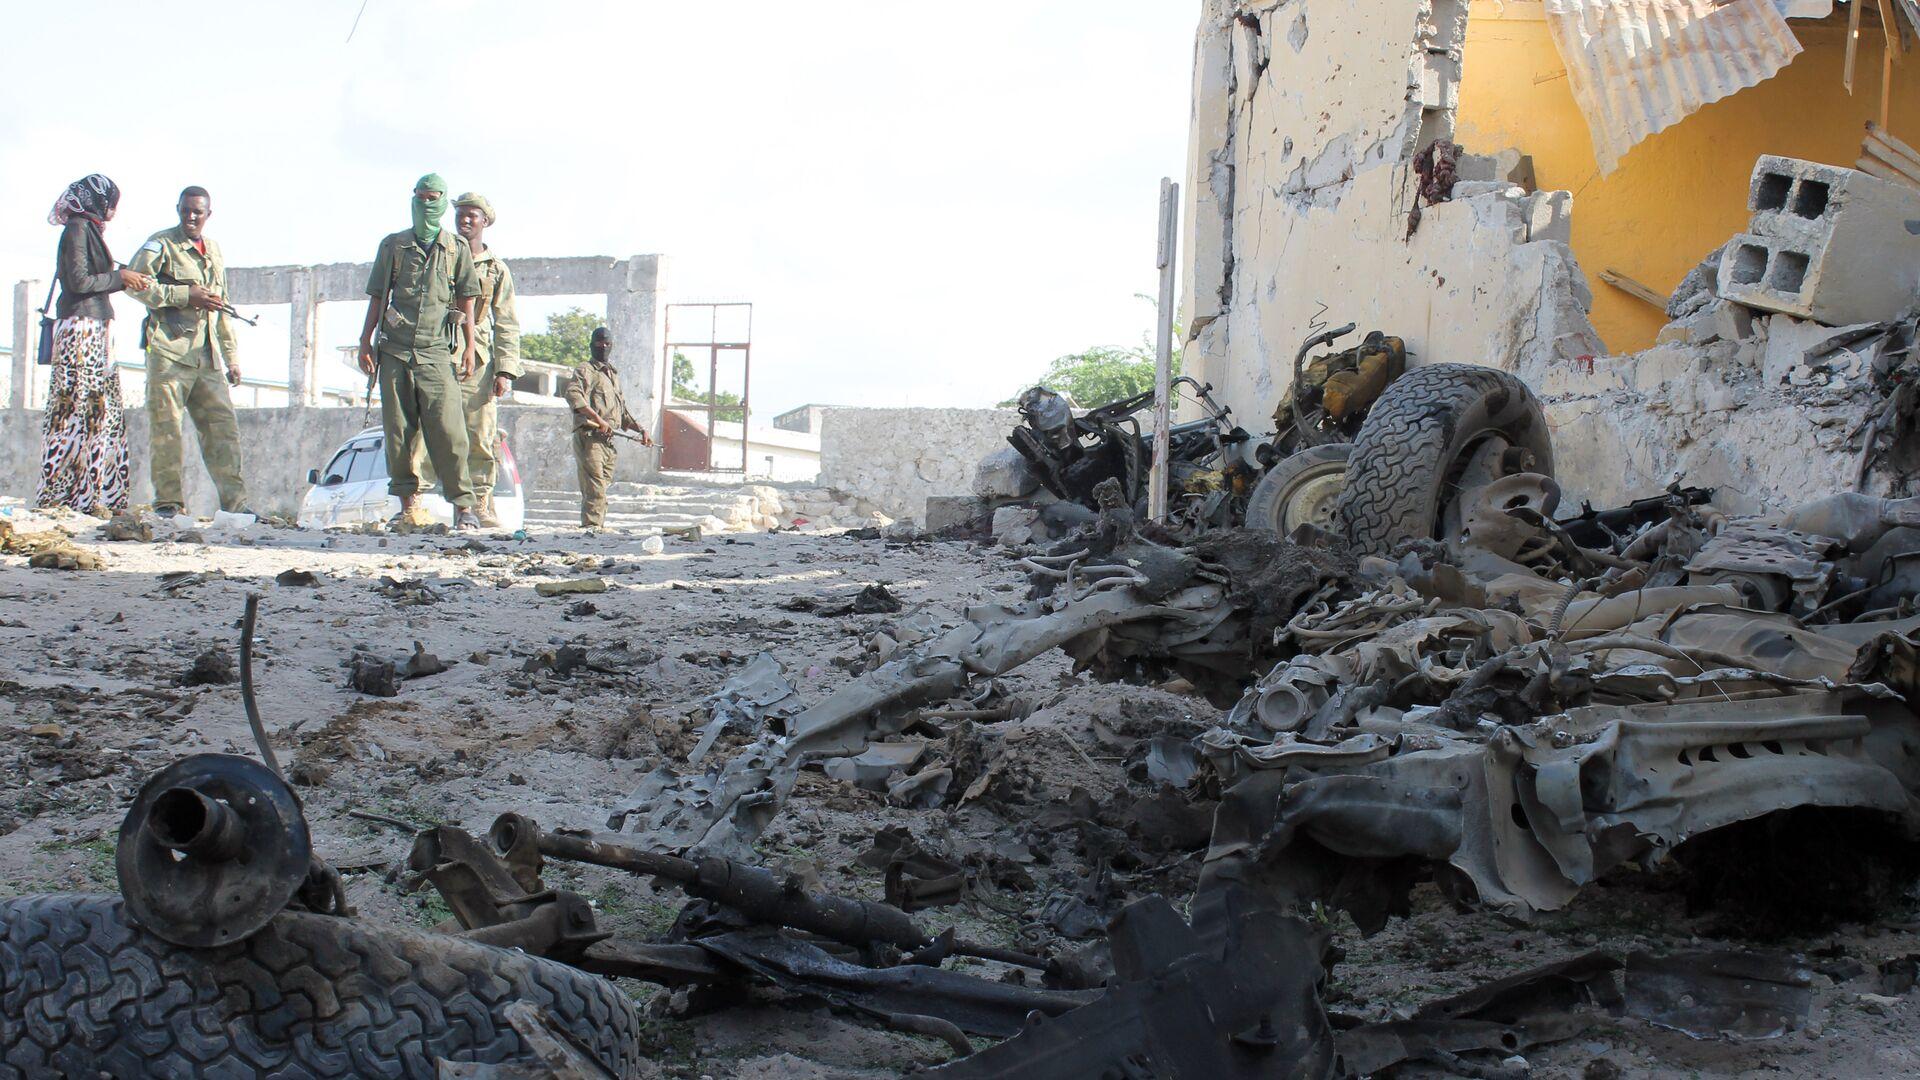 Miliziani di Al-Shabaab in Somalia - Sputnik Italia, 1920, 22.08.2021